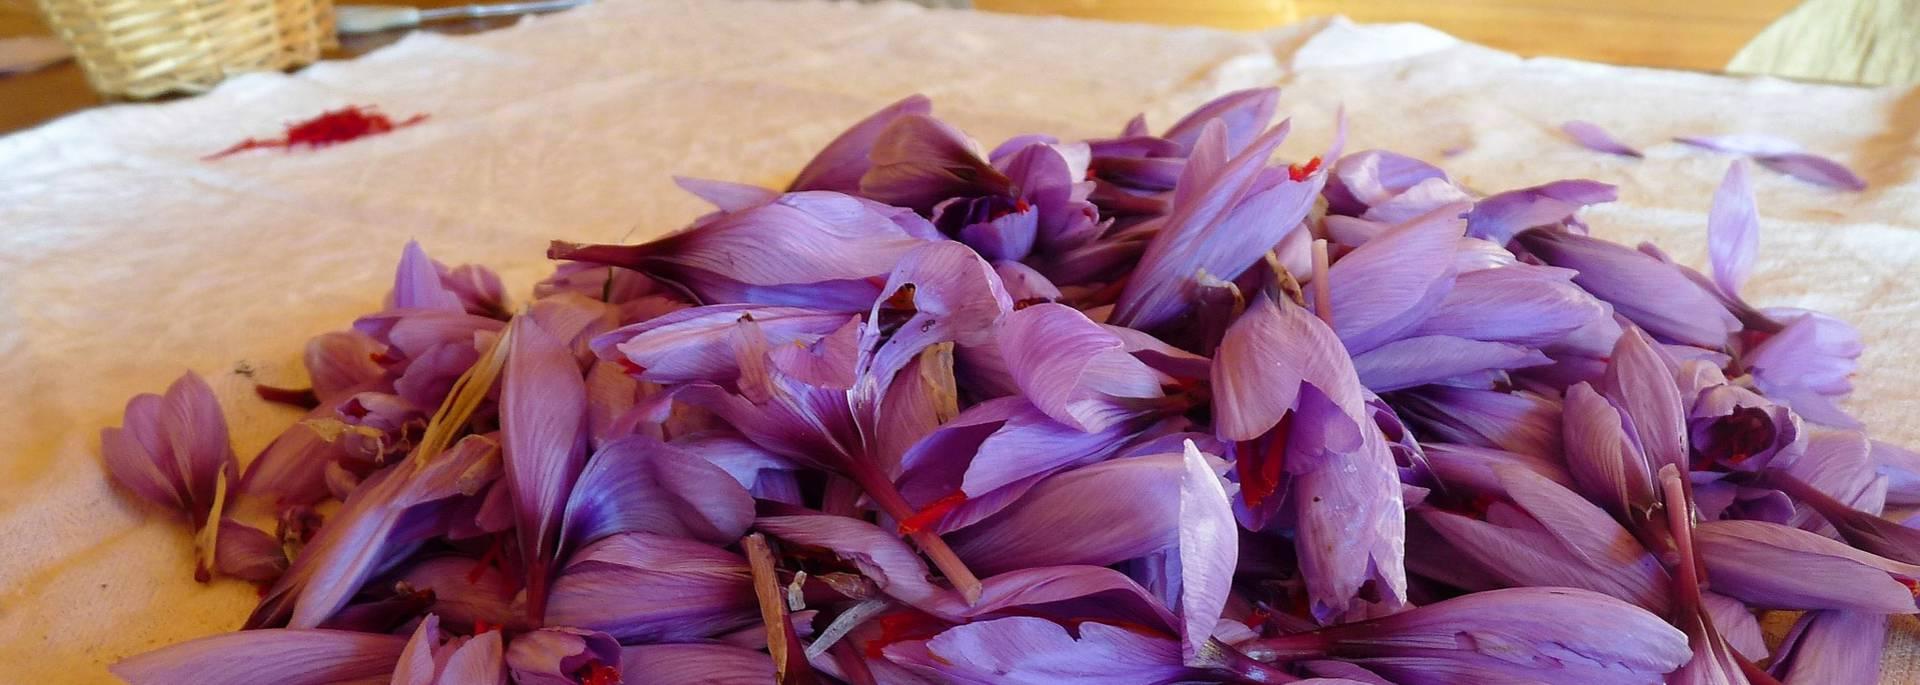 Fleurs de safran en Pays Bigouden © G Mazingue